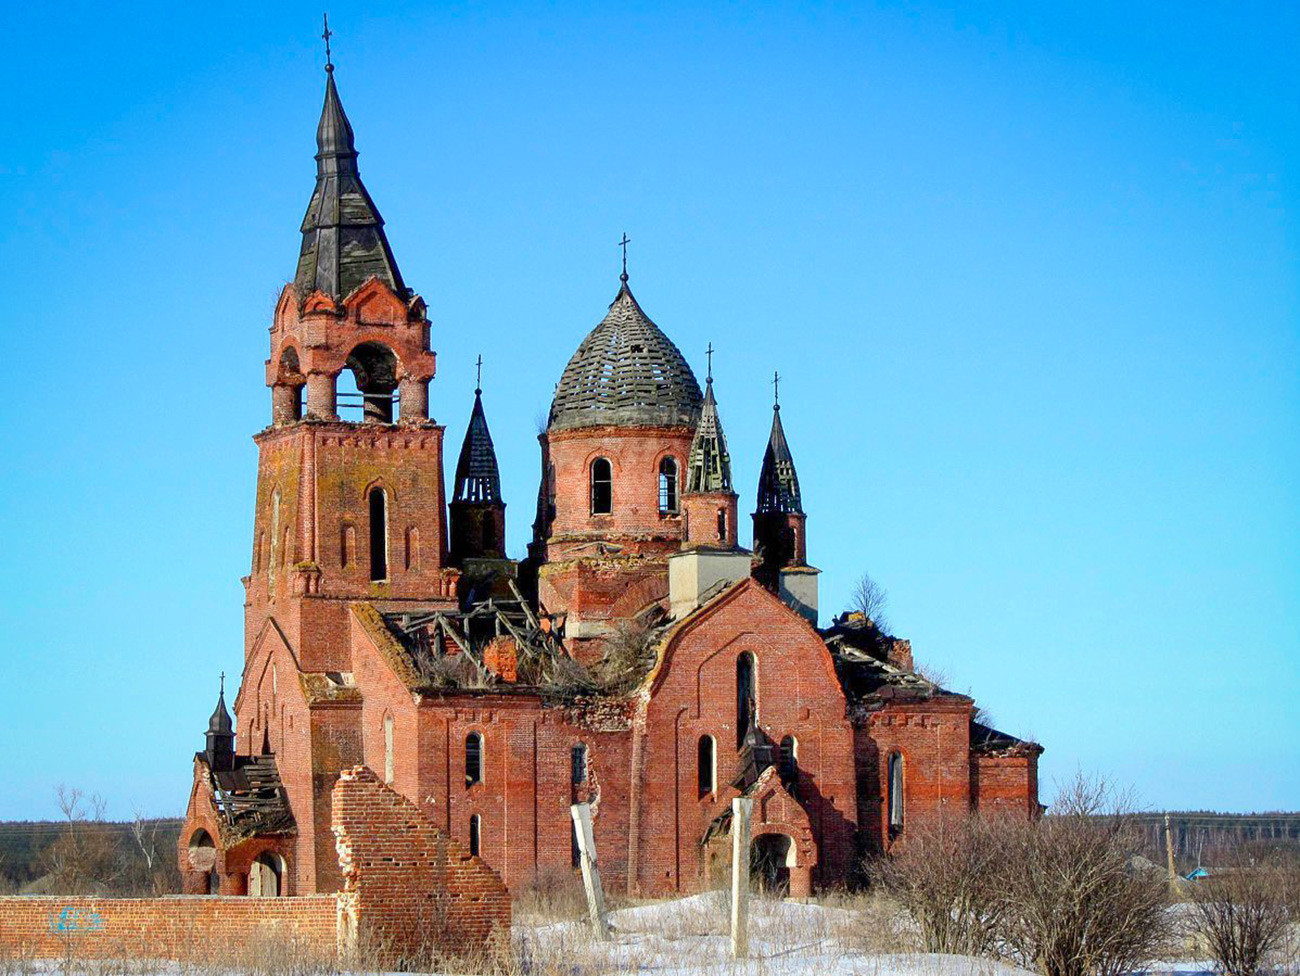 Church of the Presentation, village of Pyot, Ryazan Region, early 20th century